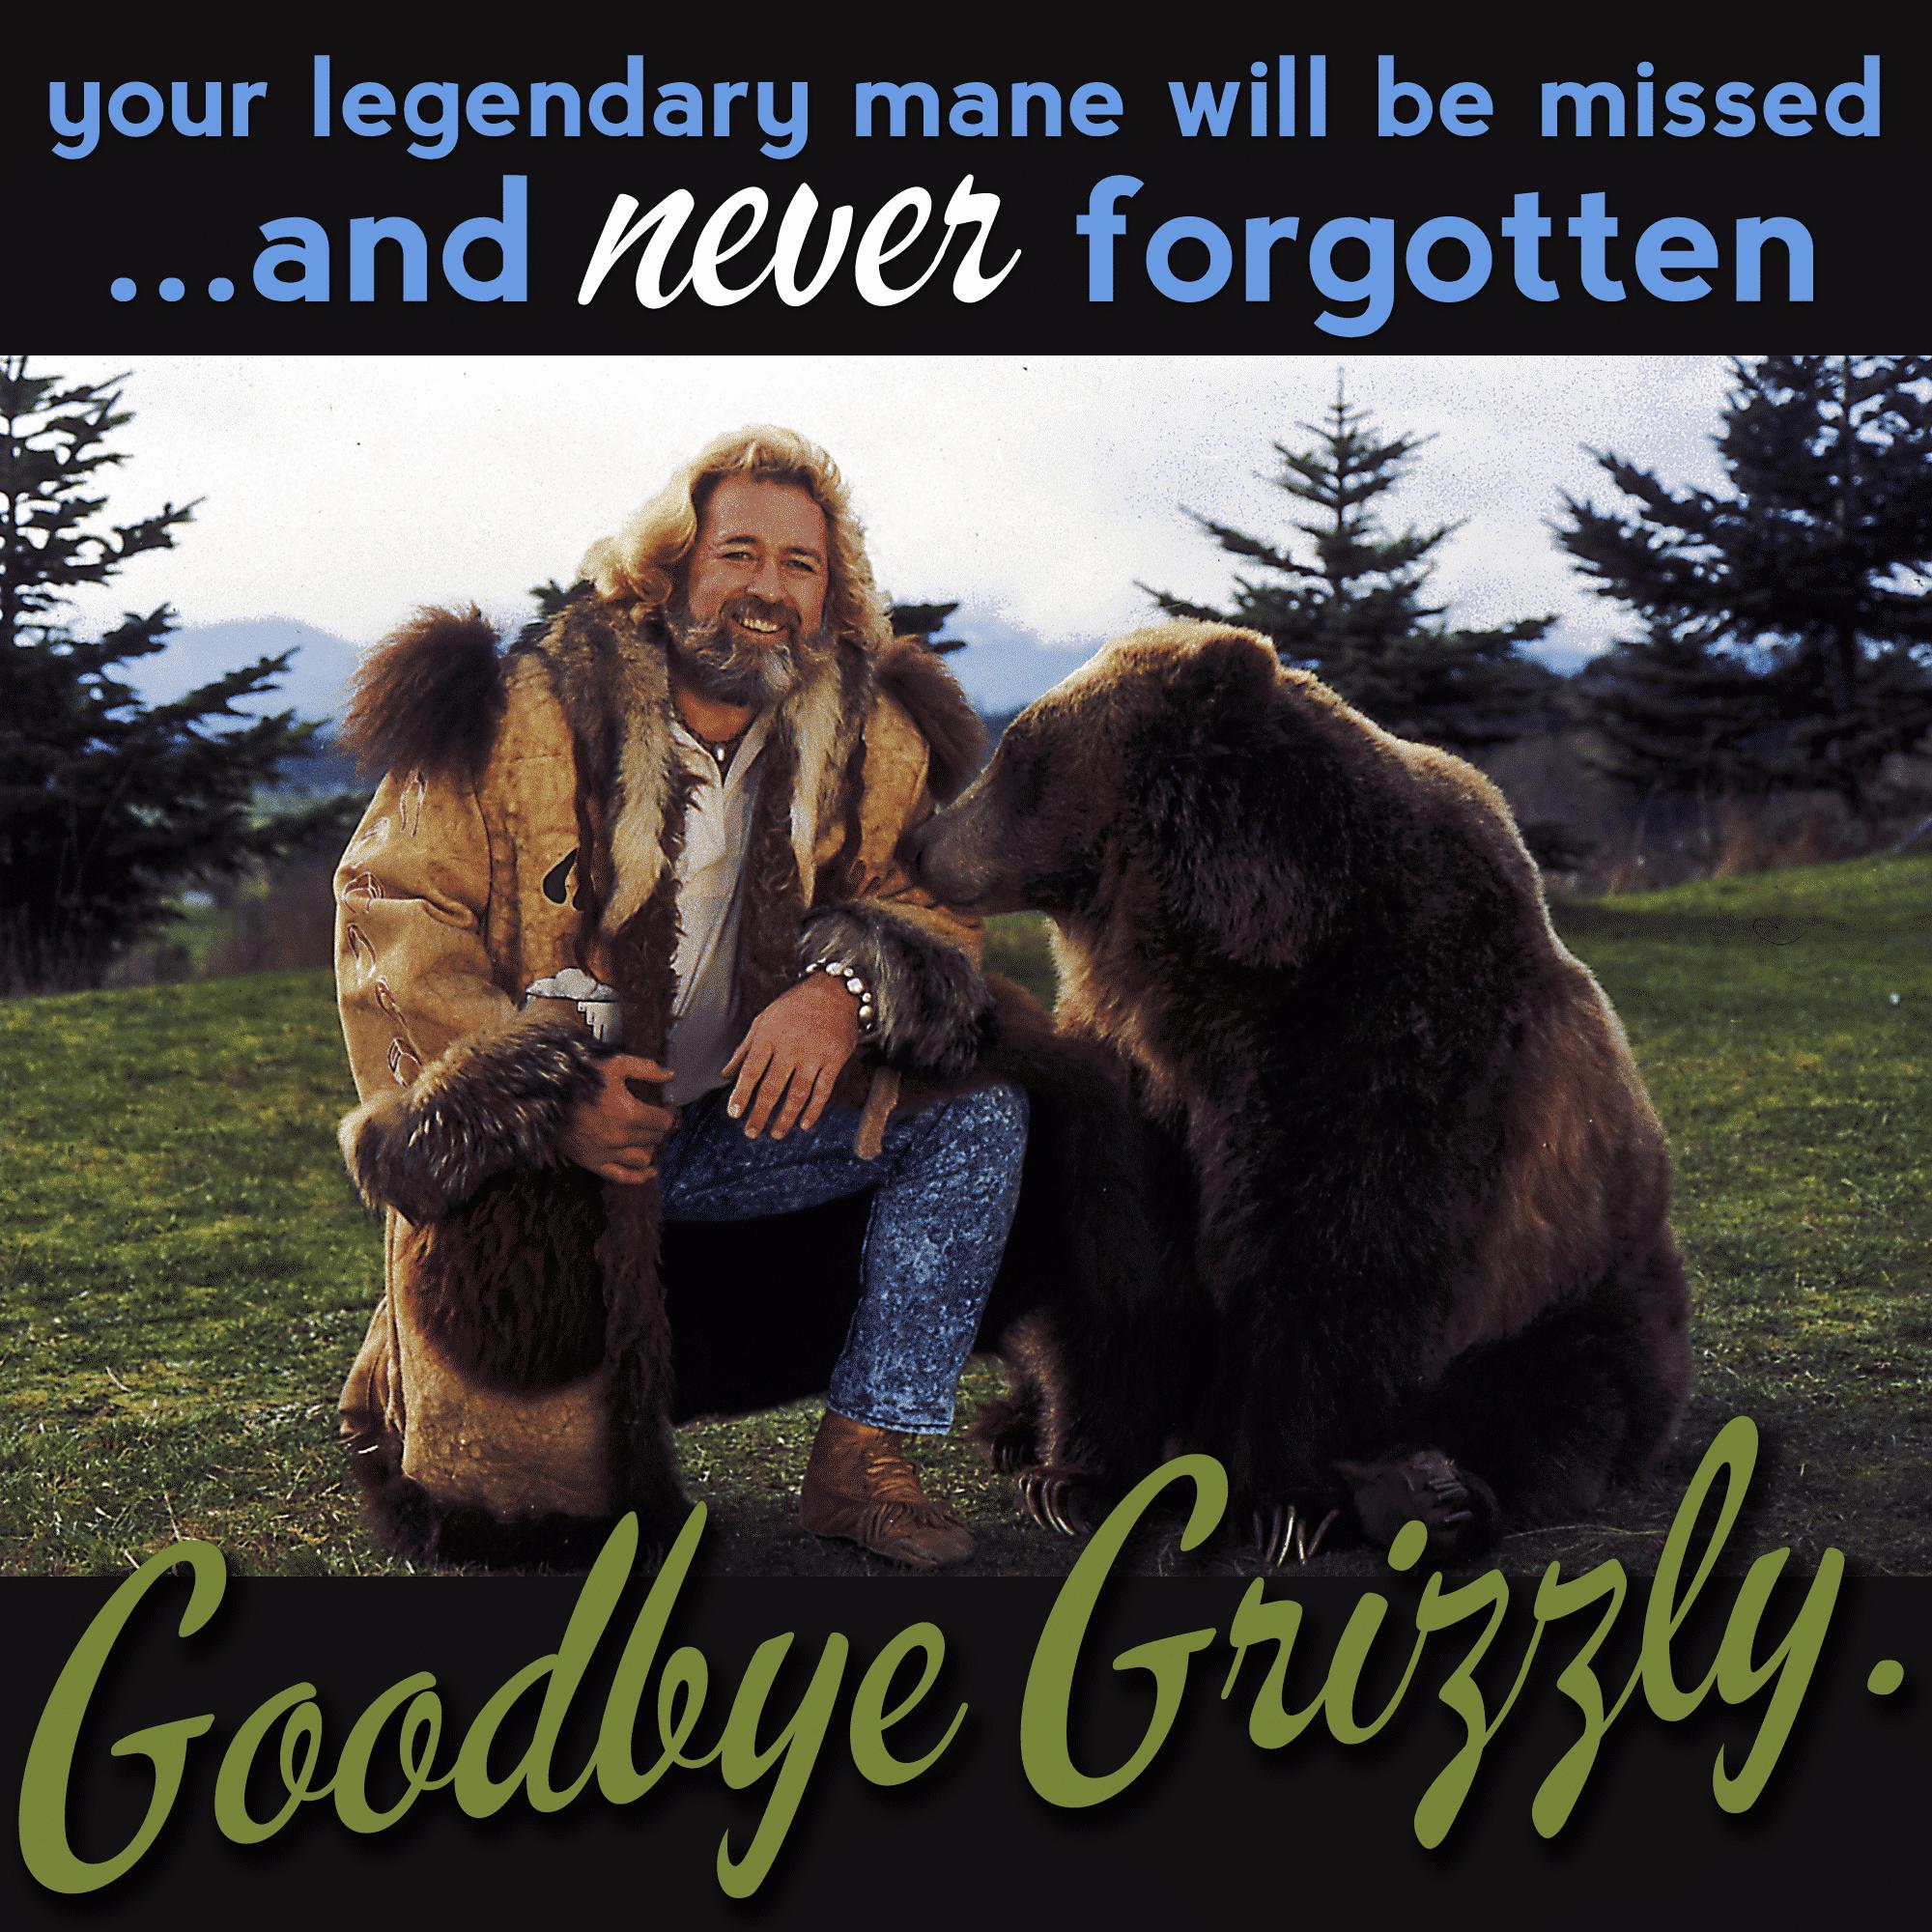 Grizzly Adams - beard legend